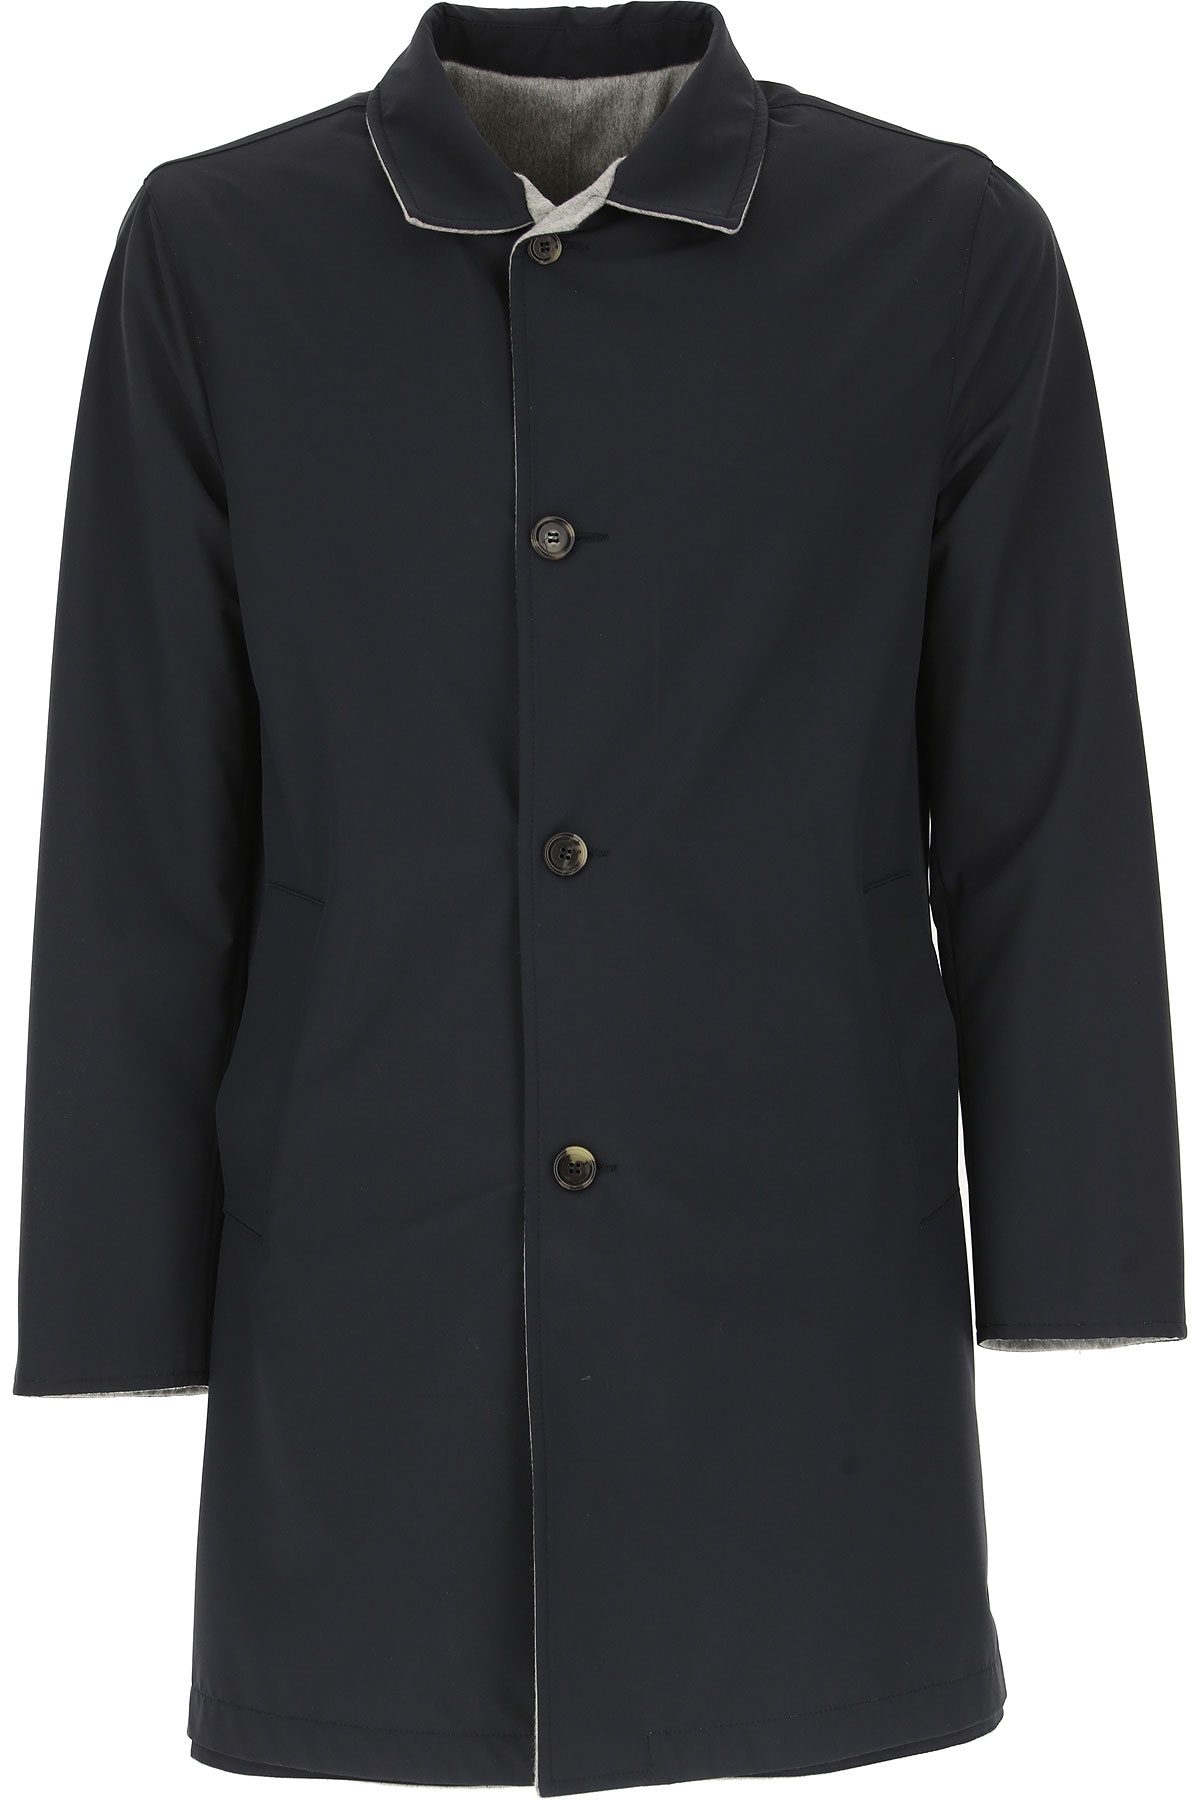 People of Shibuya Down Jacket for Men, Puffer Ski Jacket On Sale, Black, polyamide, 2019, L XL XXL